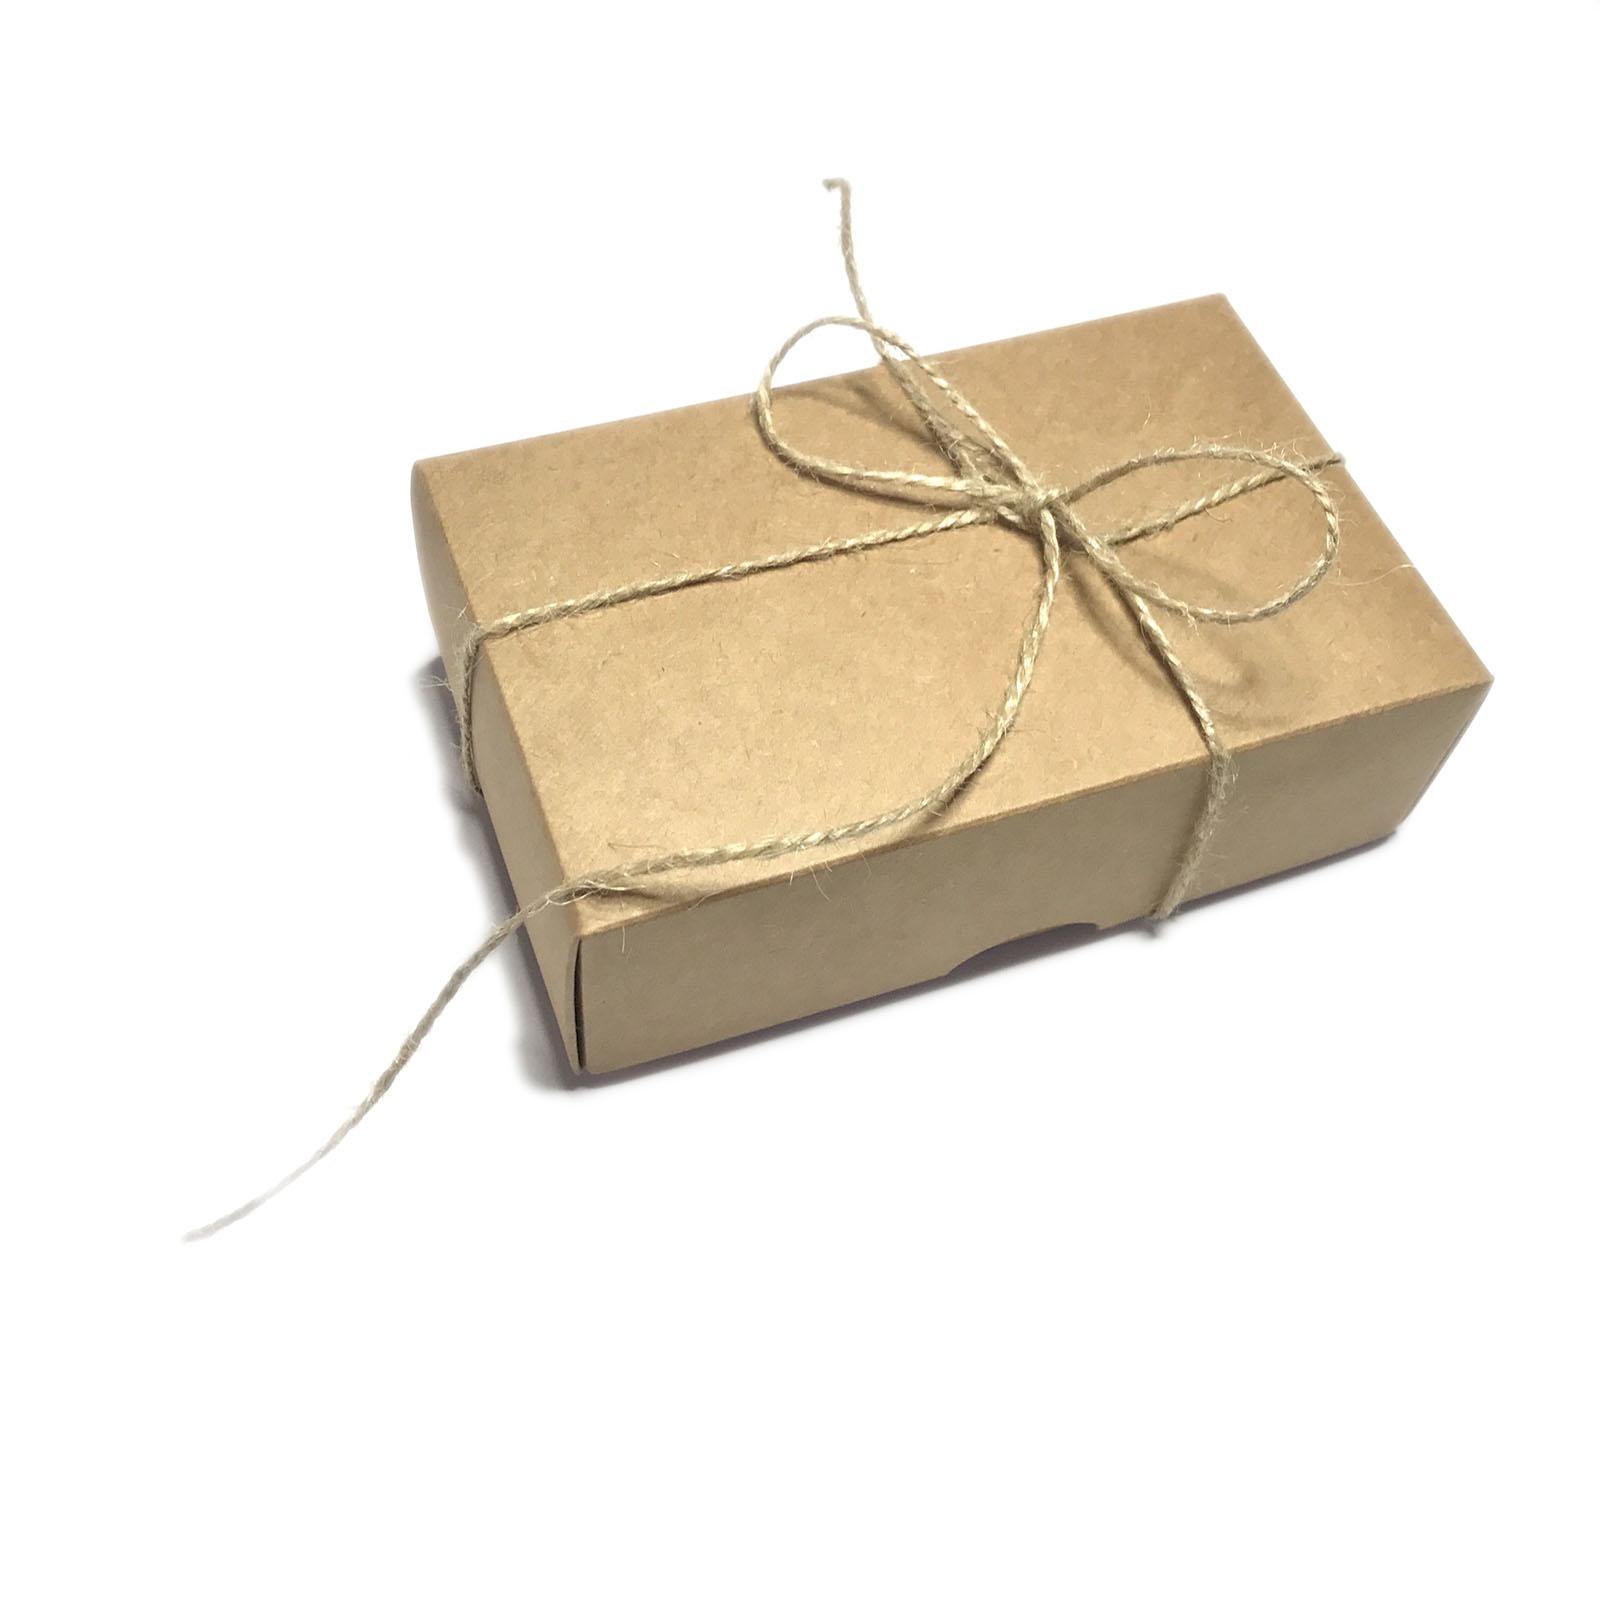 dovanos dezutes vyrams vyrui teciui sunui kartonines su bantuku dziutu